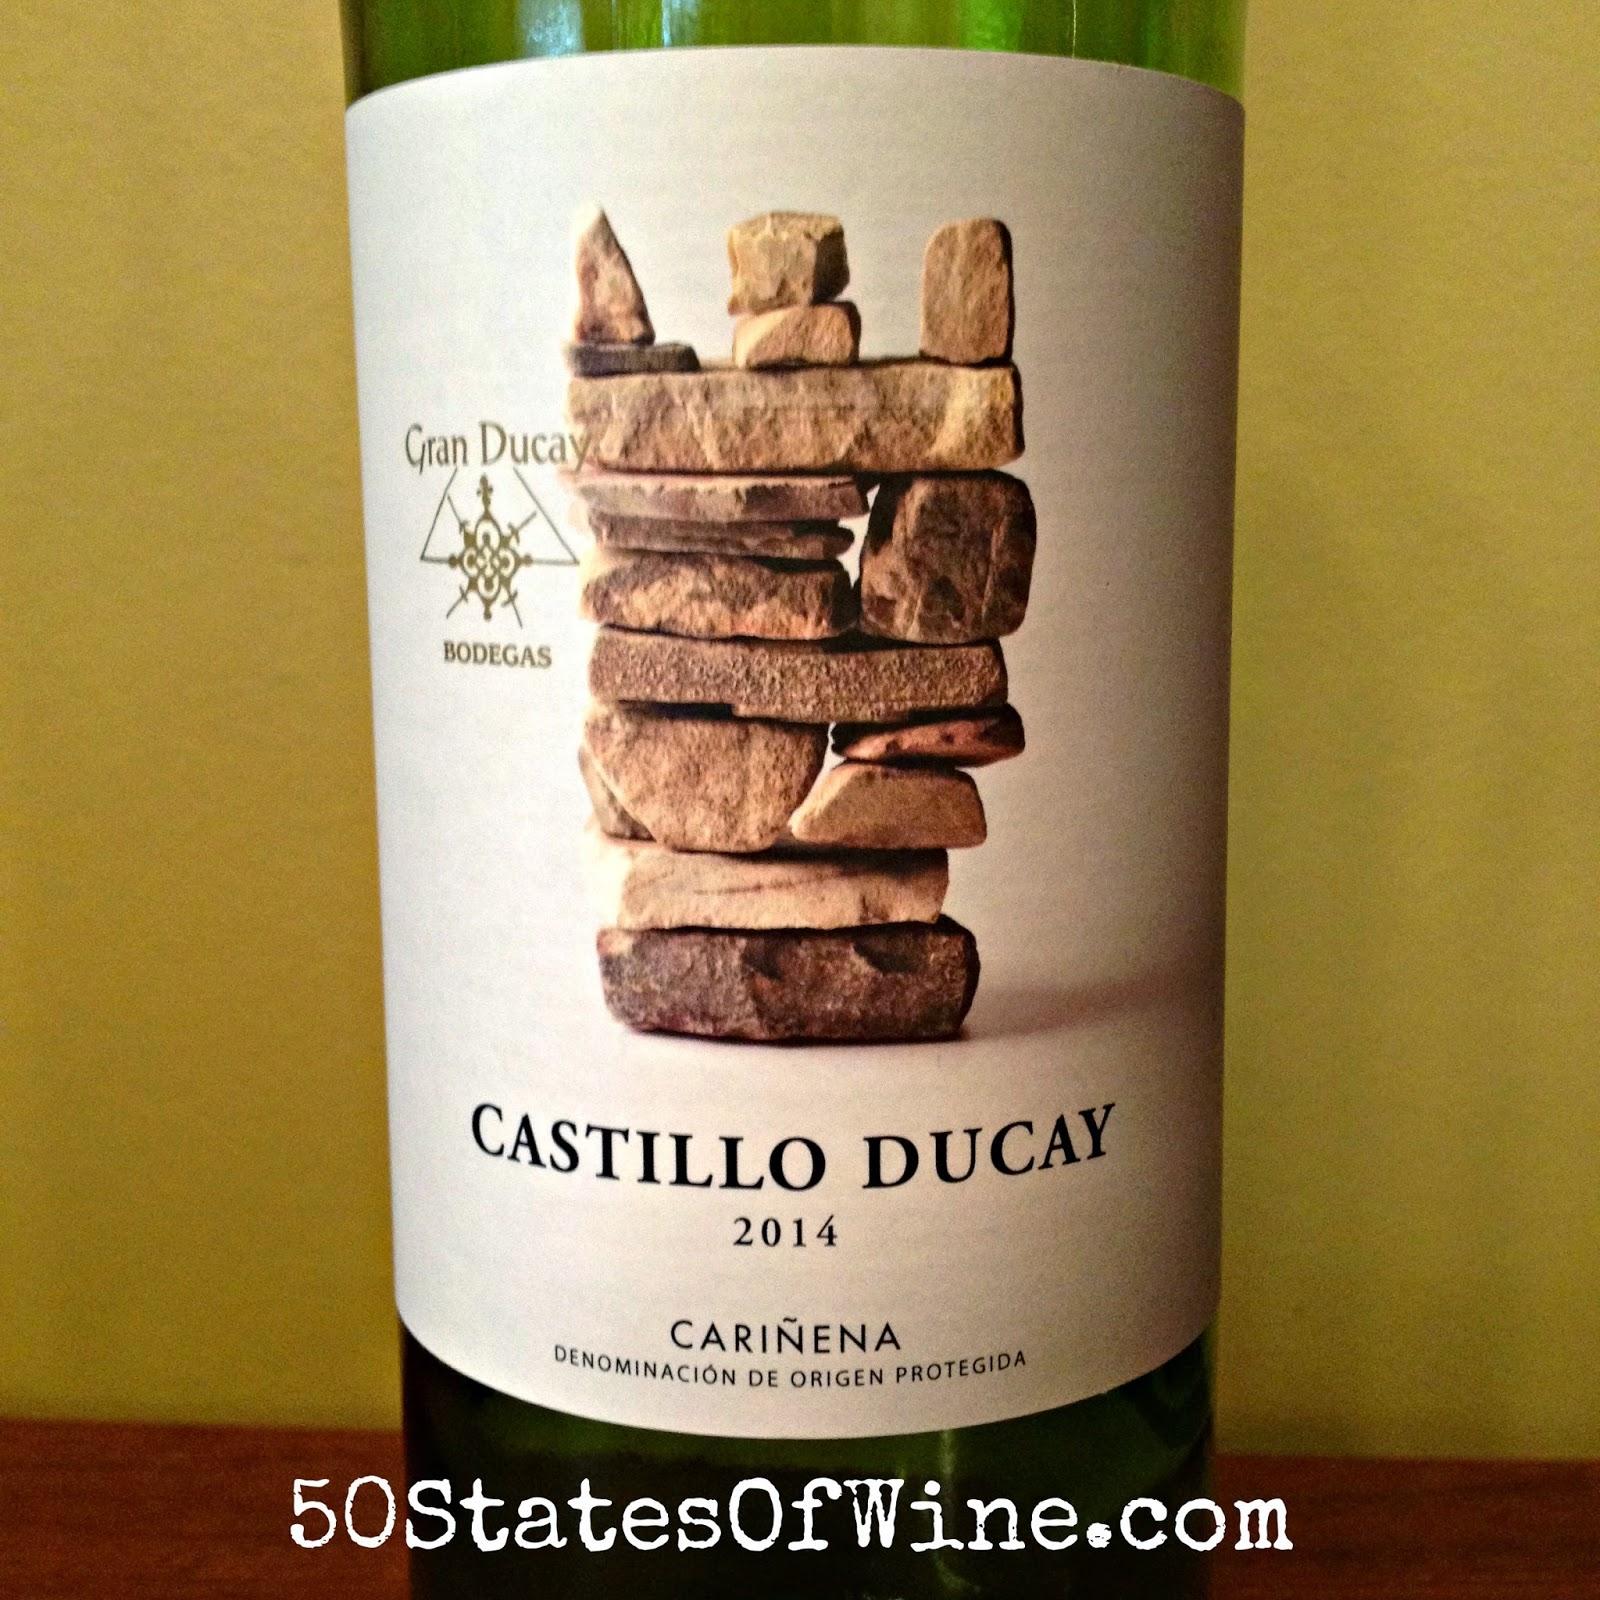 WineStudio: Bodegas San Valero